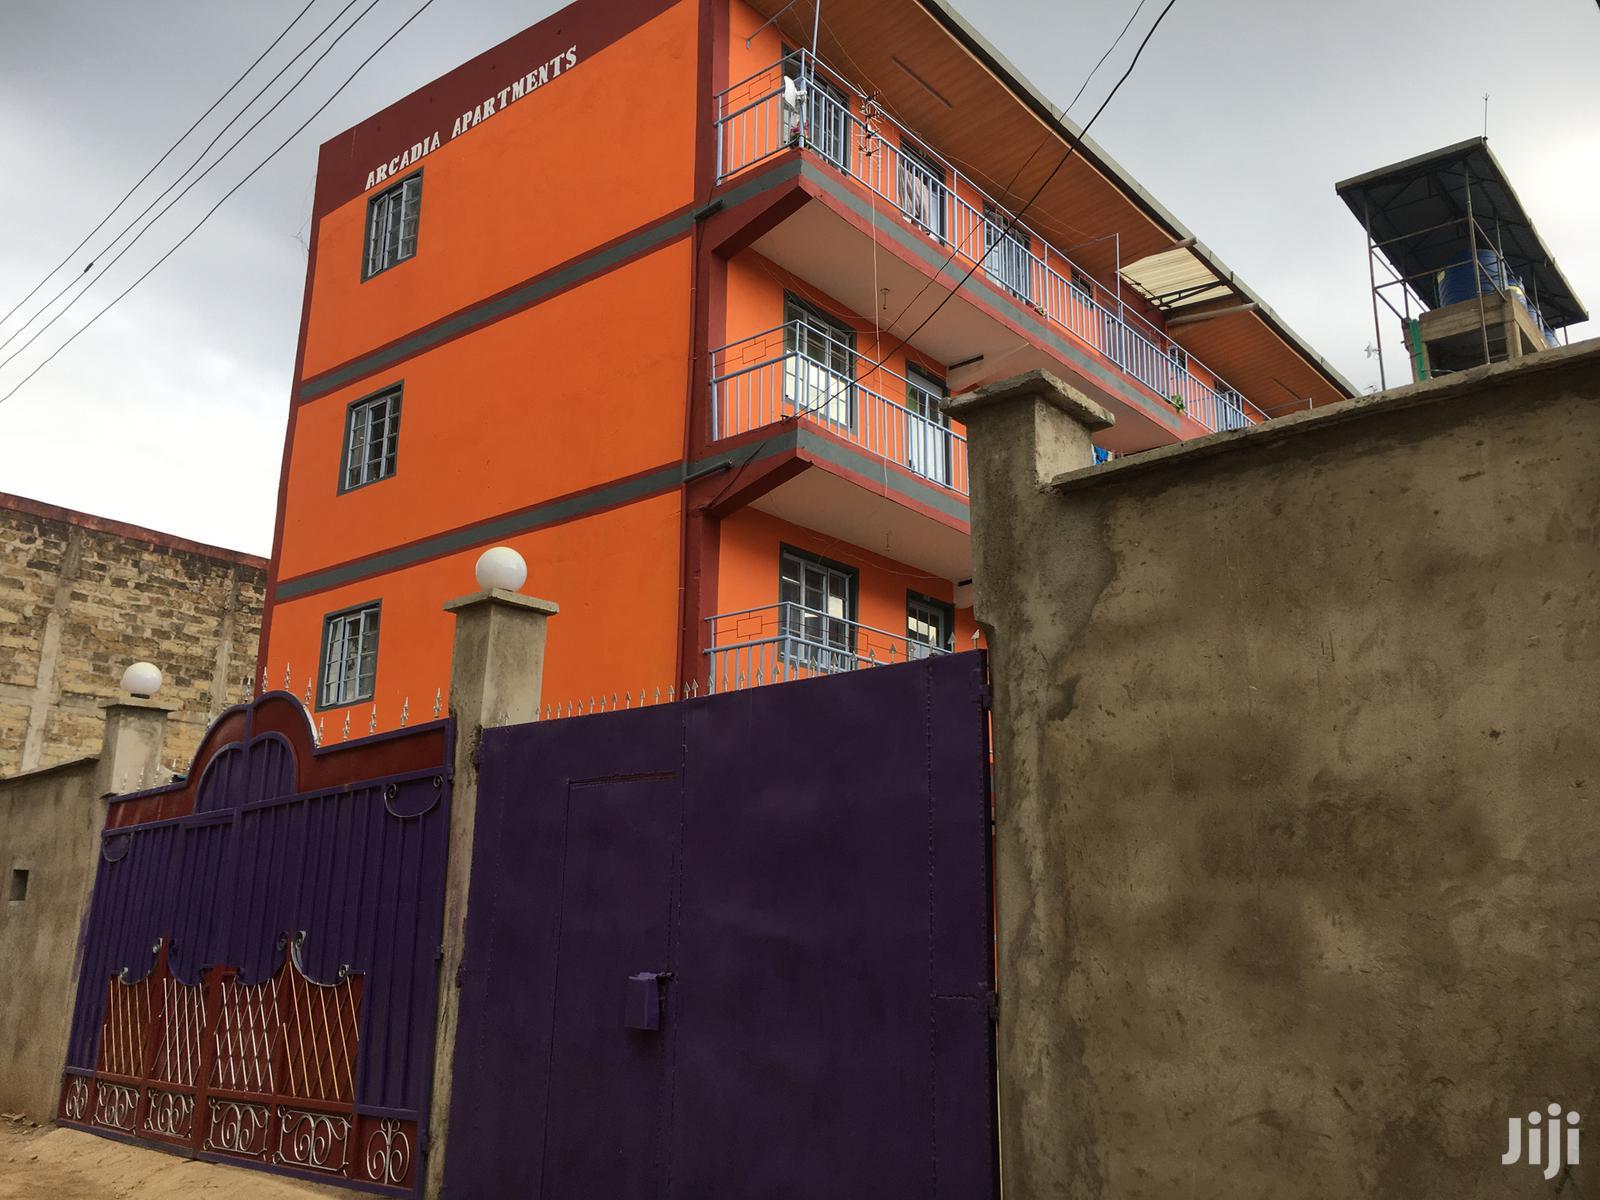 Arcadia Apartments Nkubu (Bed Sitter)